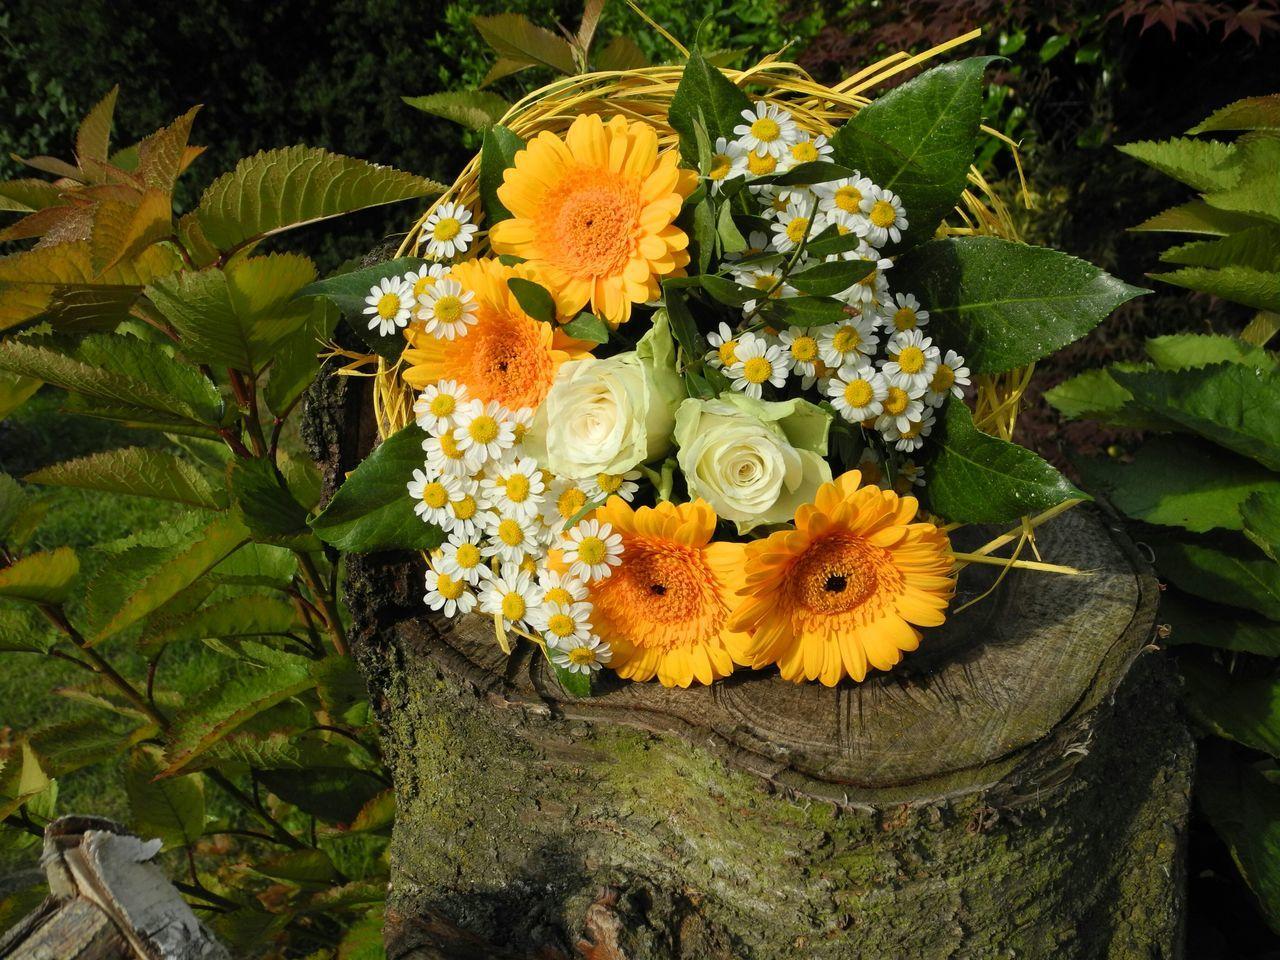 Bouquet Bouquet Of Flowers Flower Collection Flower Photography Flower Bouquet  Birthday Flowers EyeEm Best Shots - Flowers